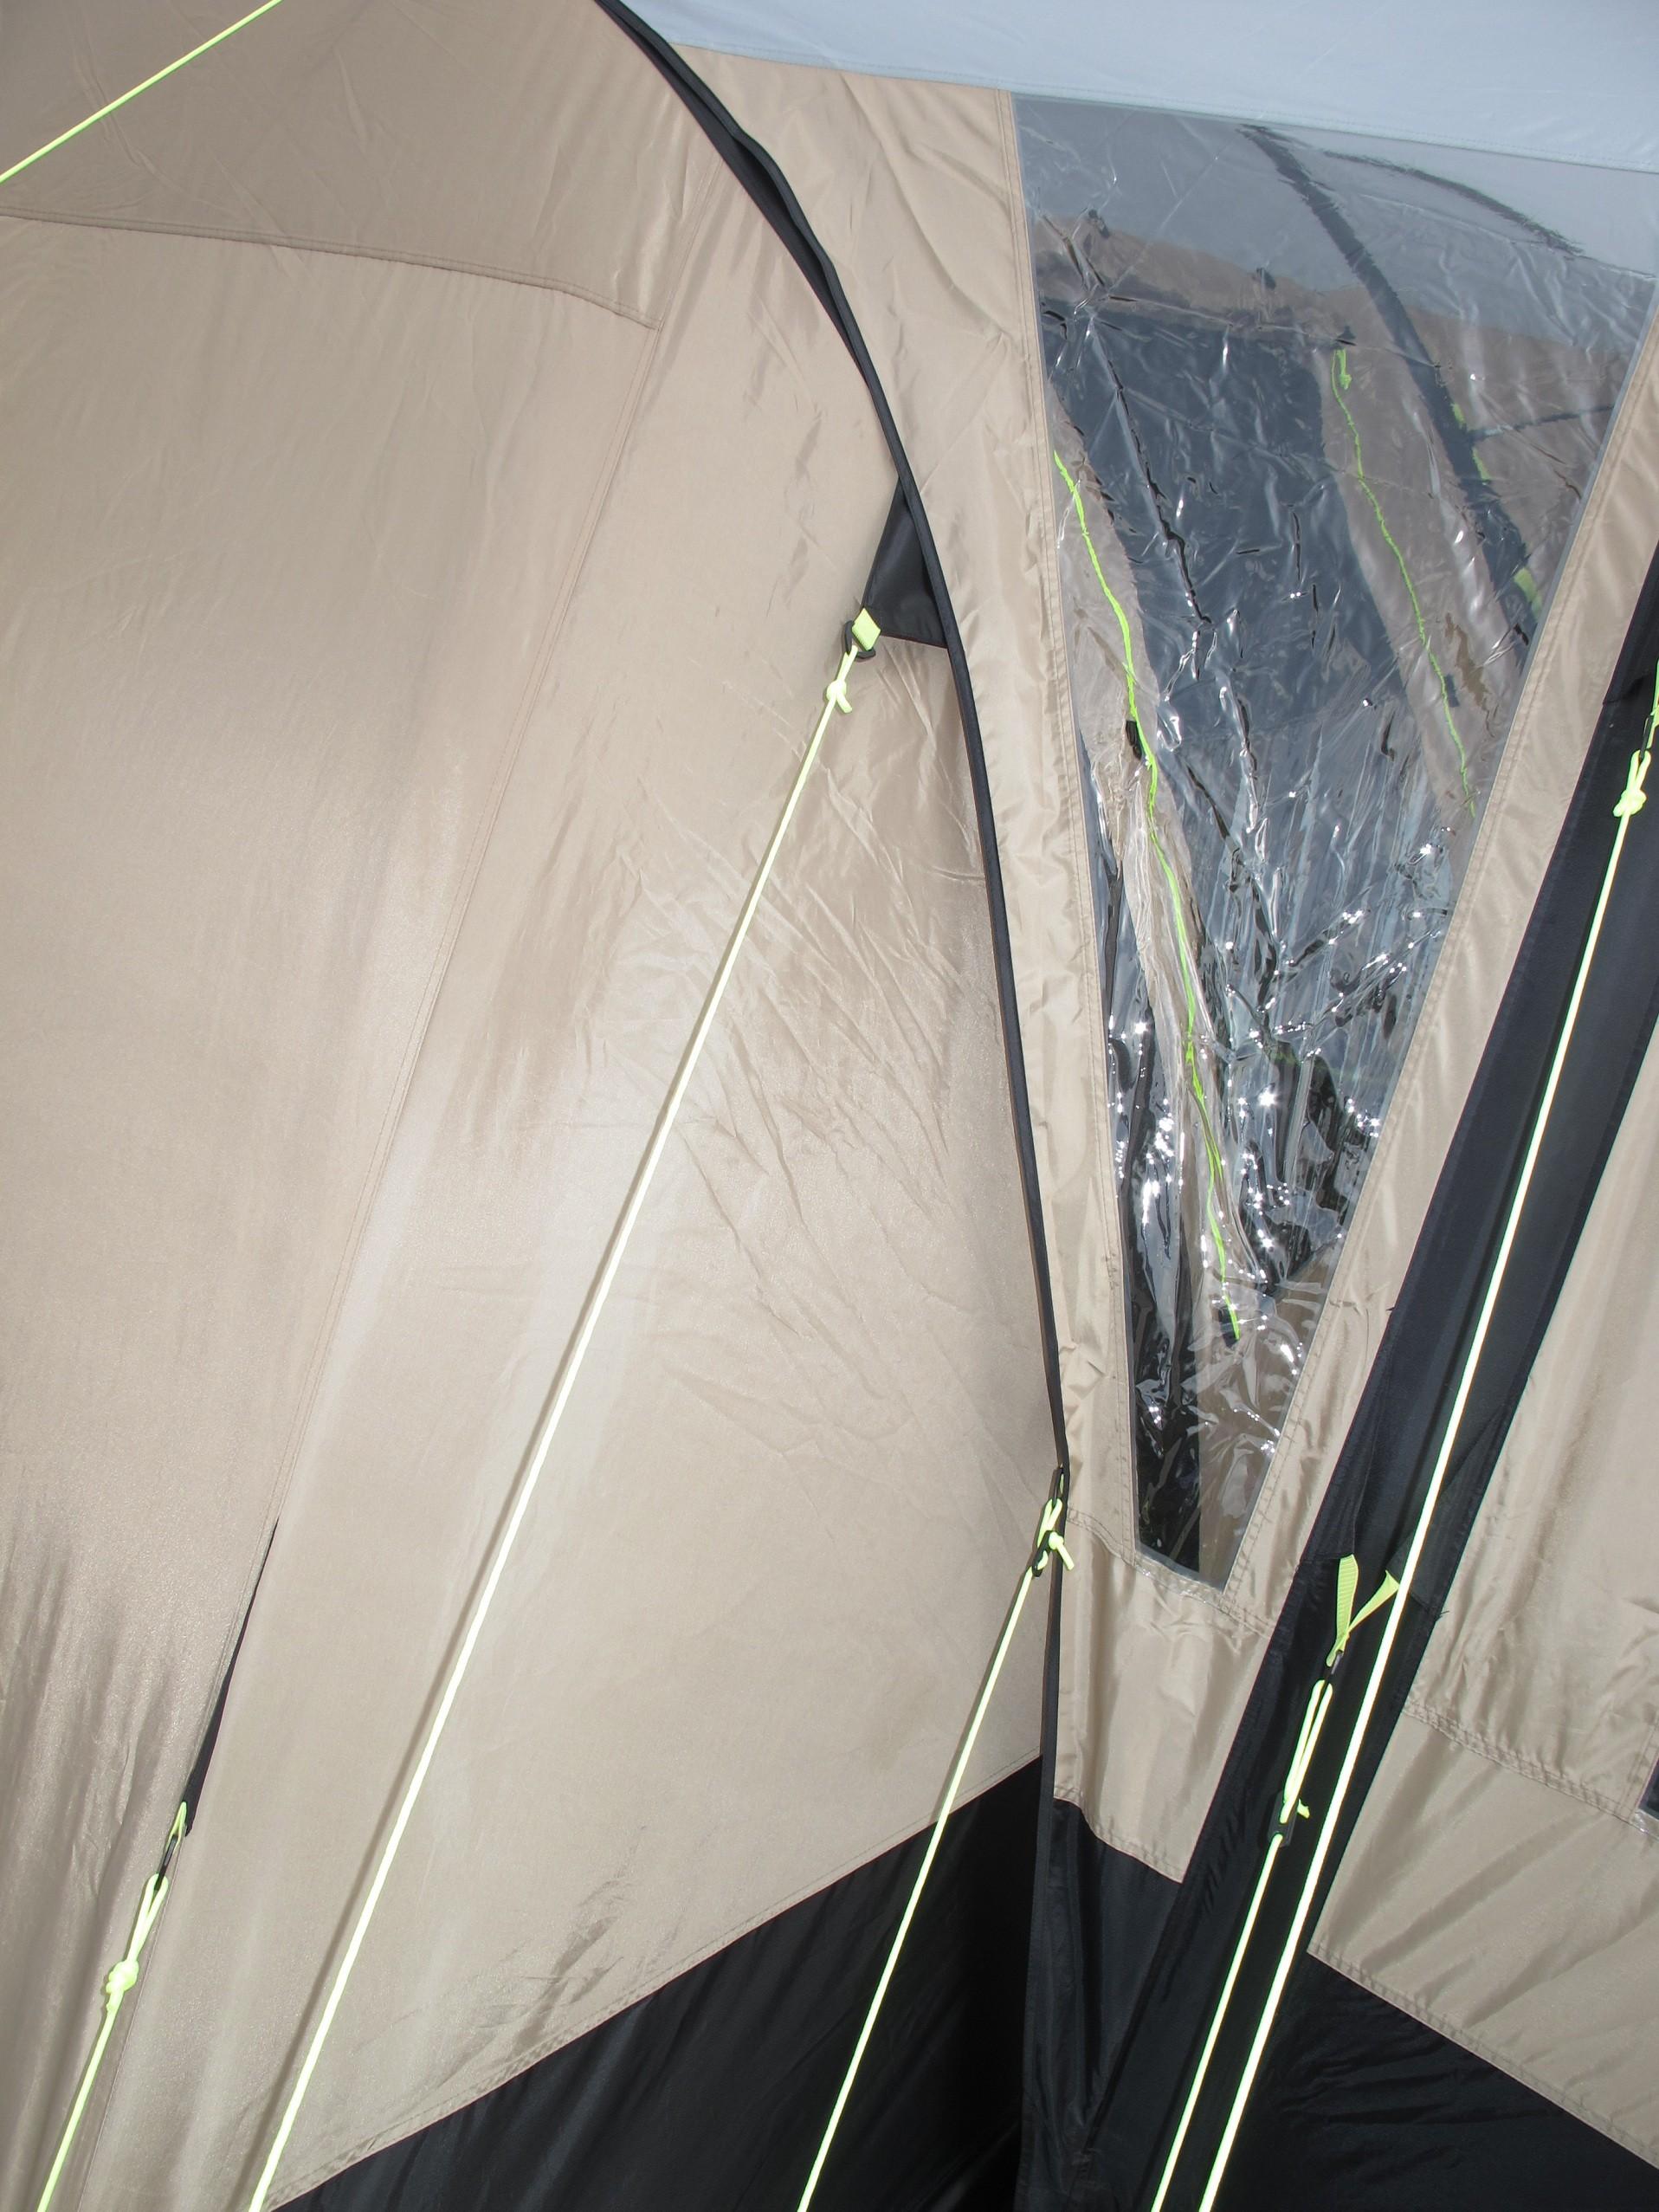 & Kampa Southwold AirFrame Canopy